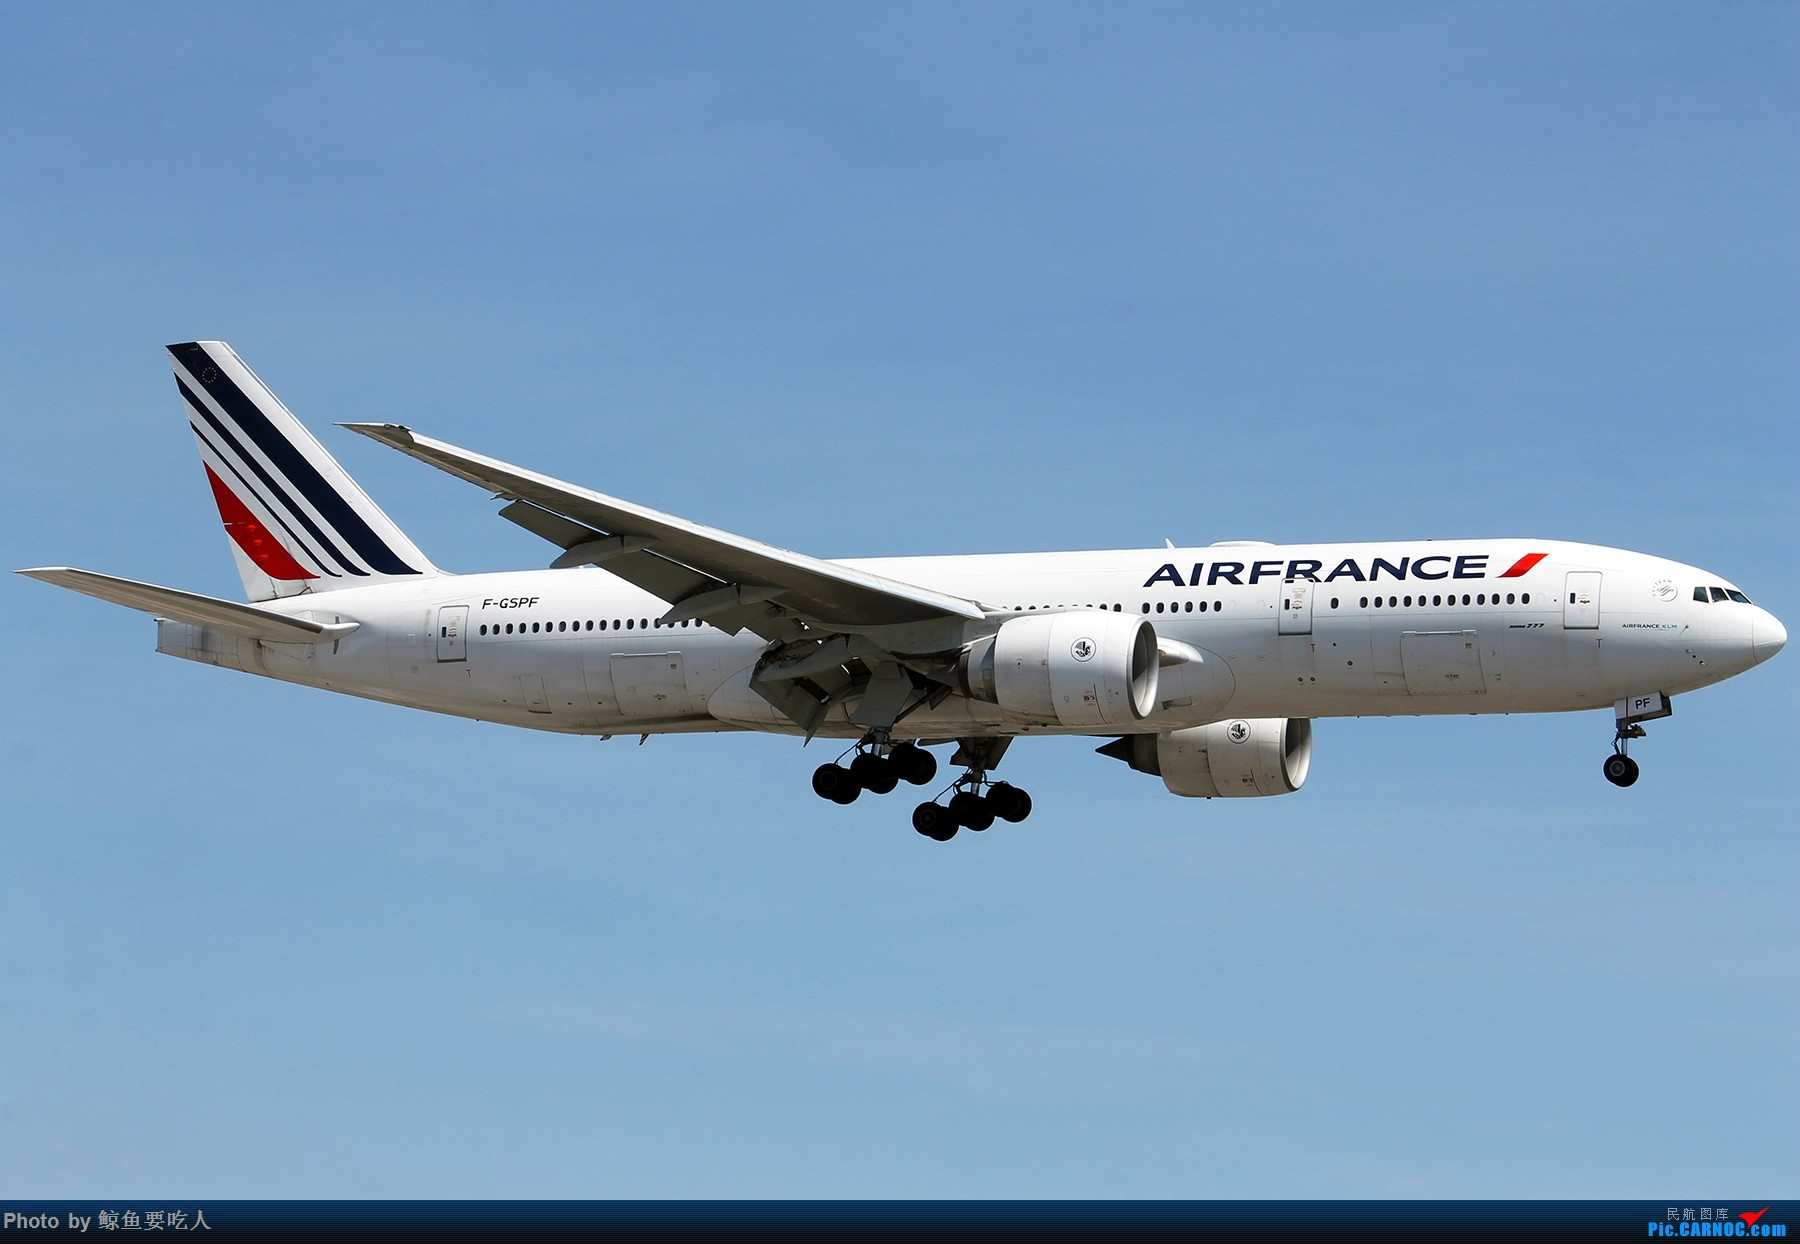 Re:[原创][Steven@YYZ] 多伦多皮尔逊国际机场晴天降落一组~~~ BOEING 777-200 F-GSPF 多伦多皮尔逊国际机场